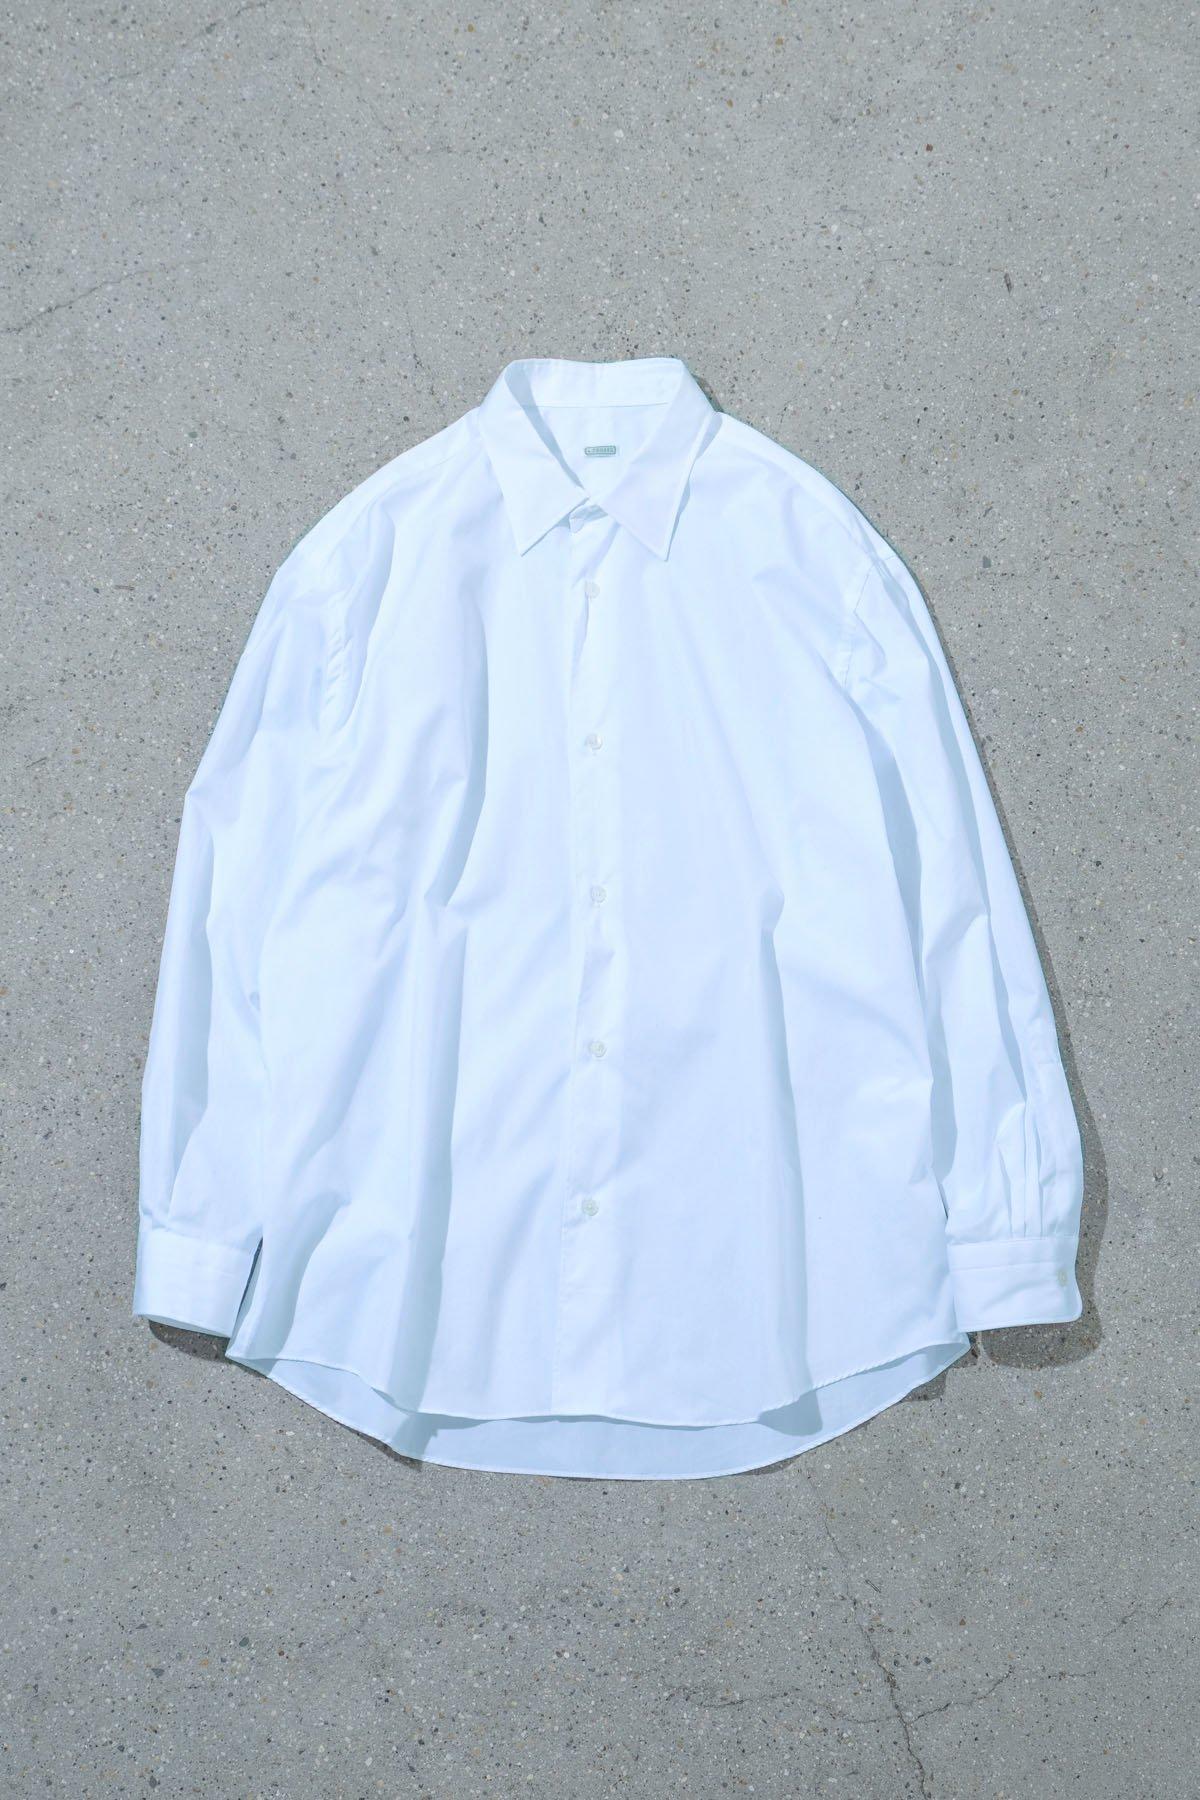 A.PRESSE / Regular Collar Shirt